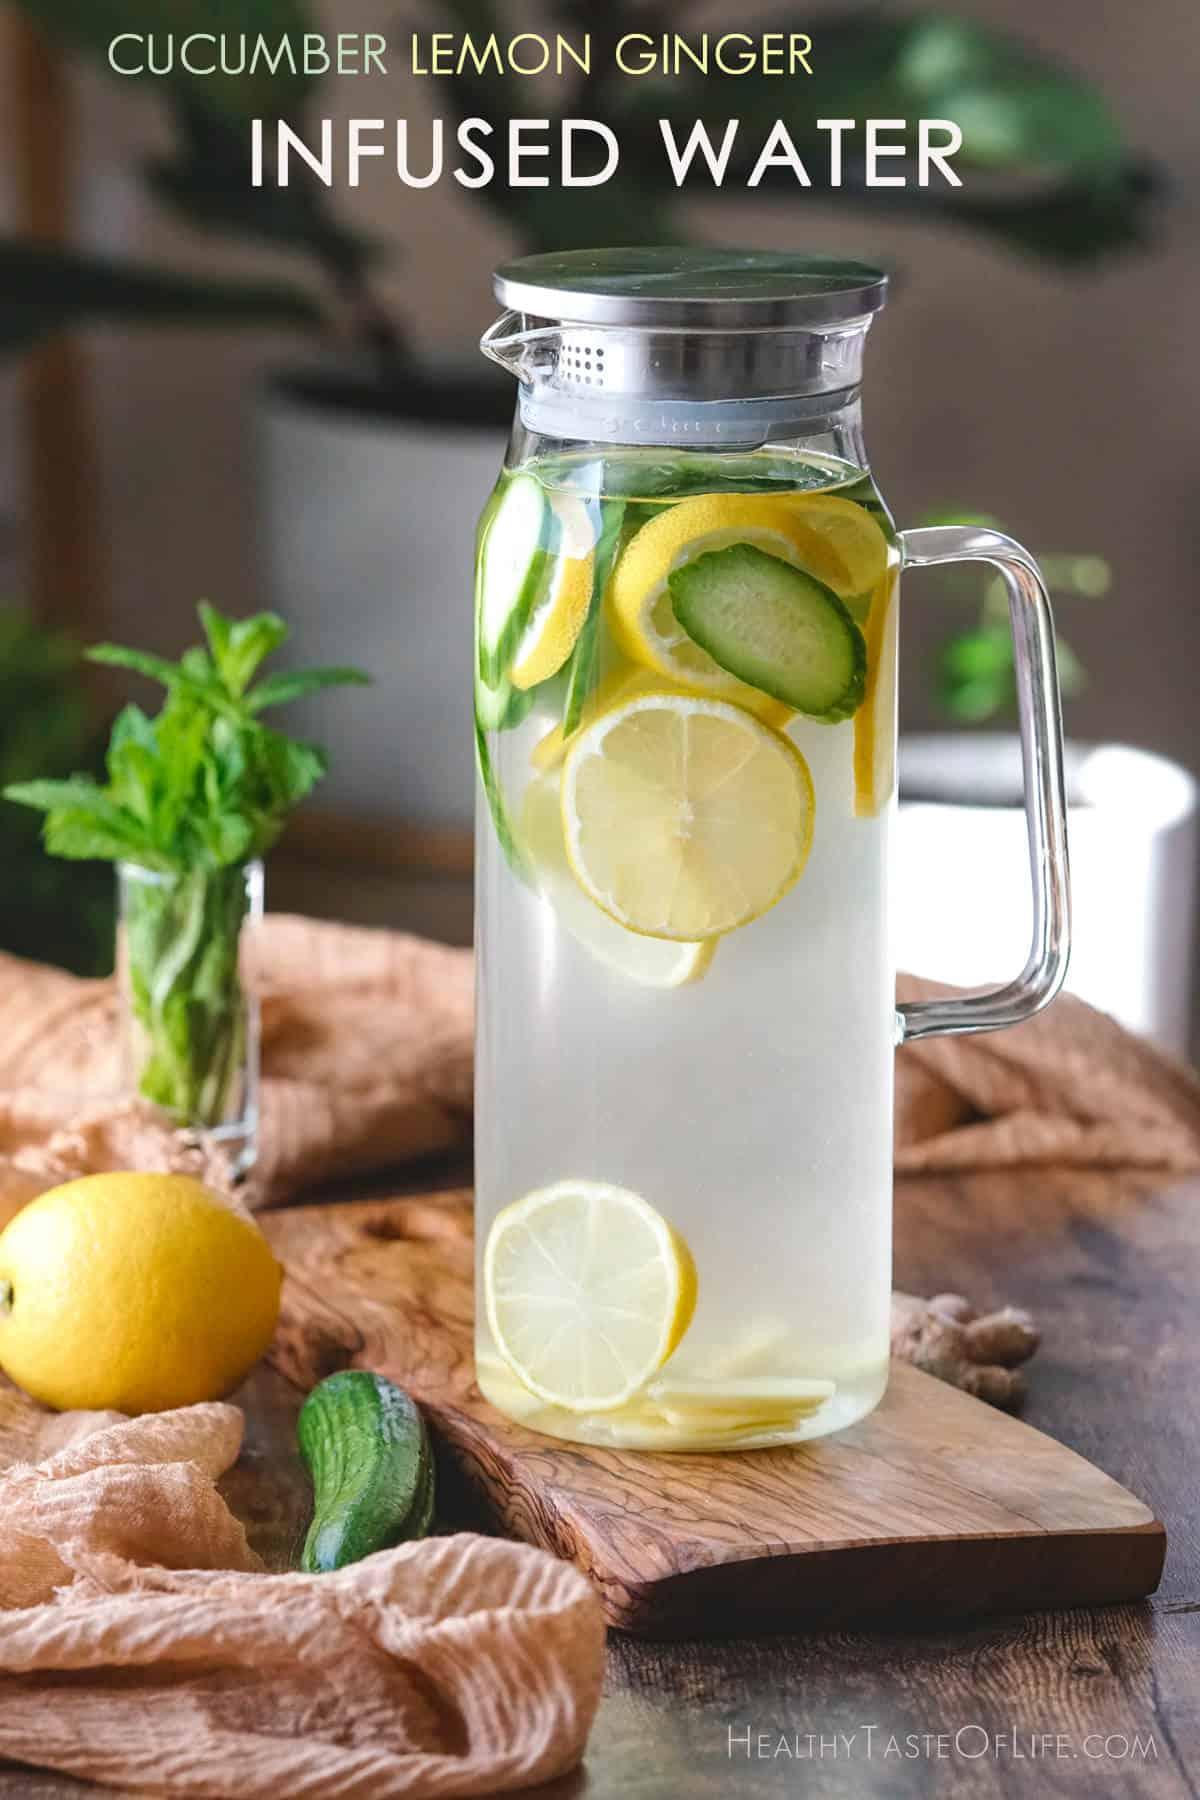 Cucumber lemon ginger water recipe.